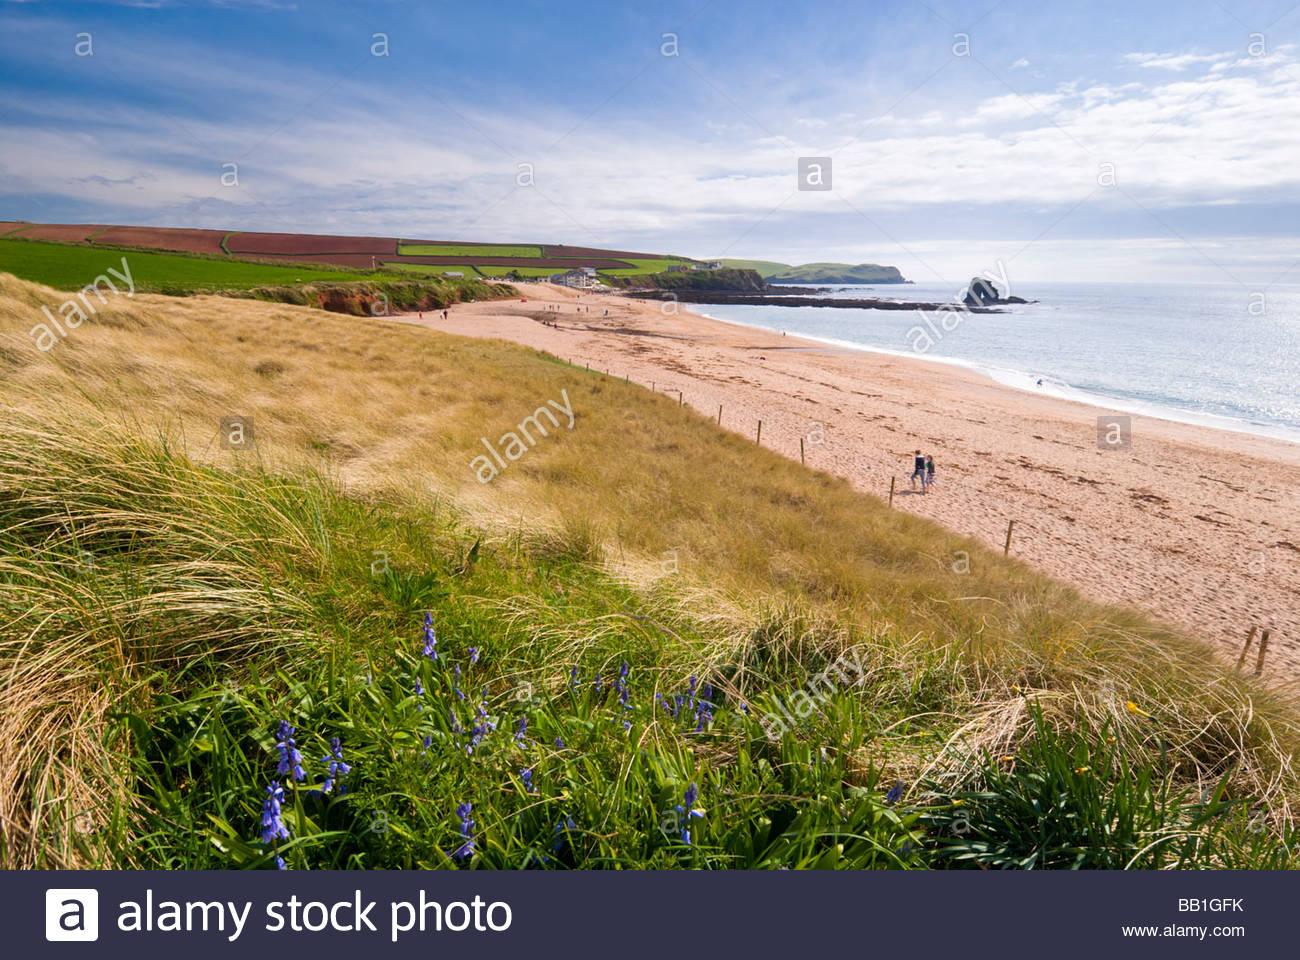 The beach at Thurlestone (South Milton Sands), South Hams, South Devon, England. - Stock Image